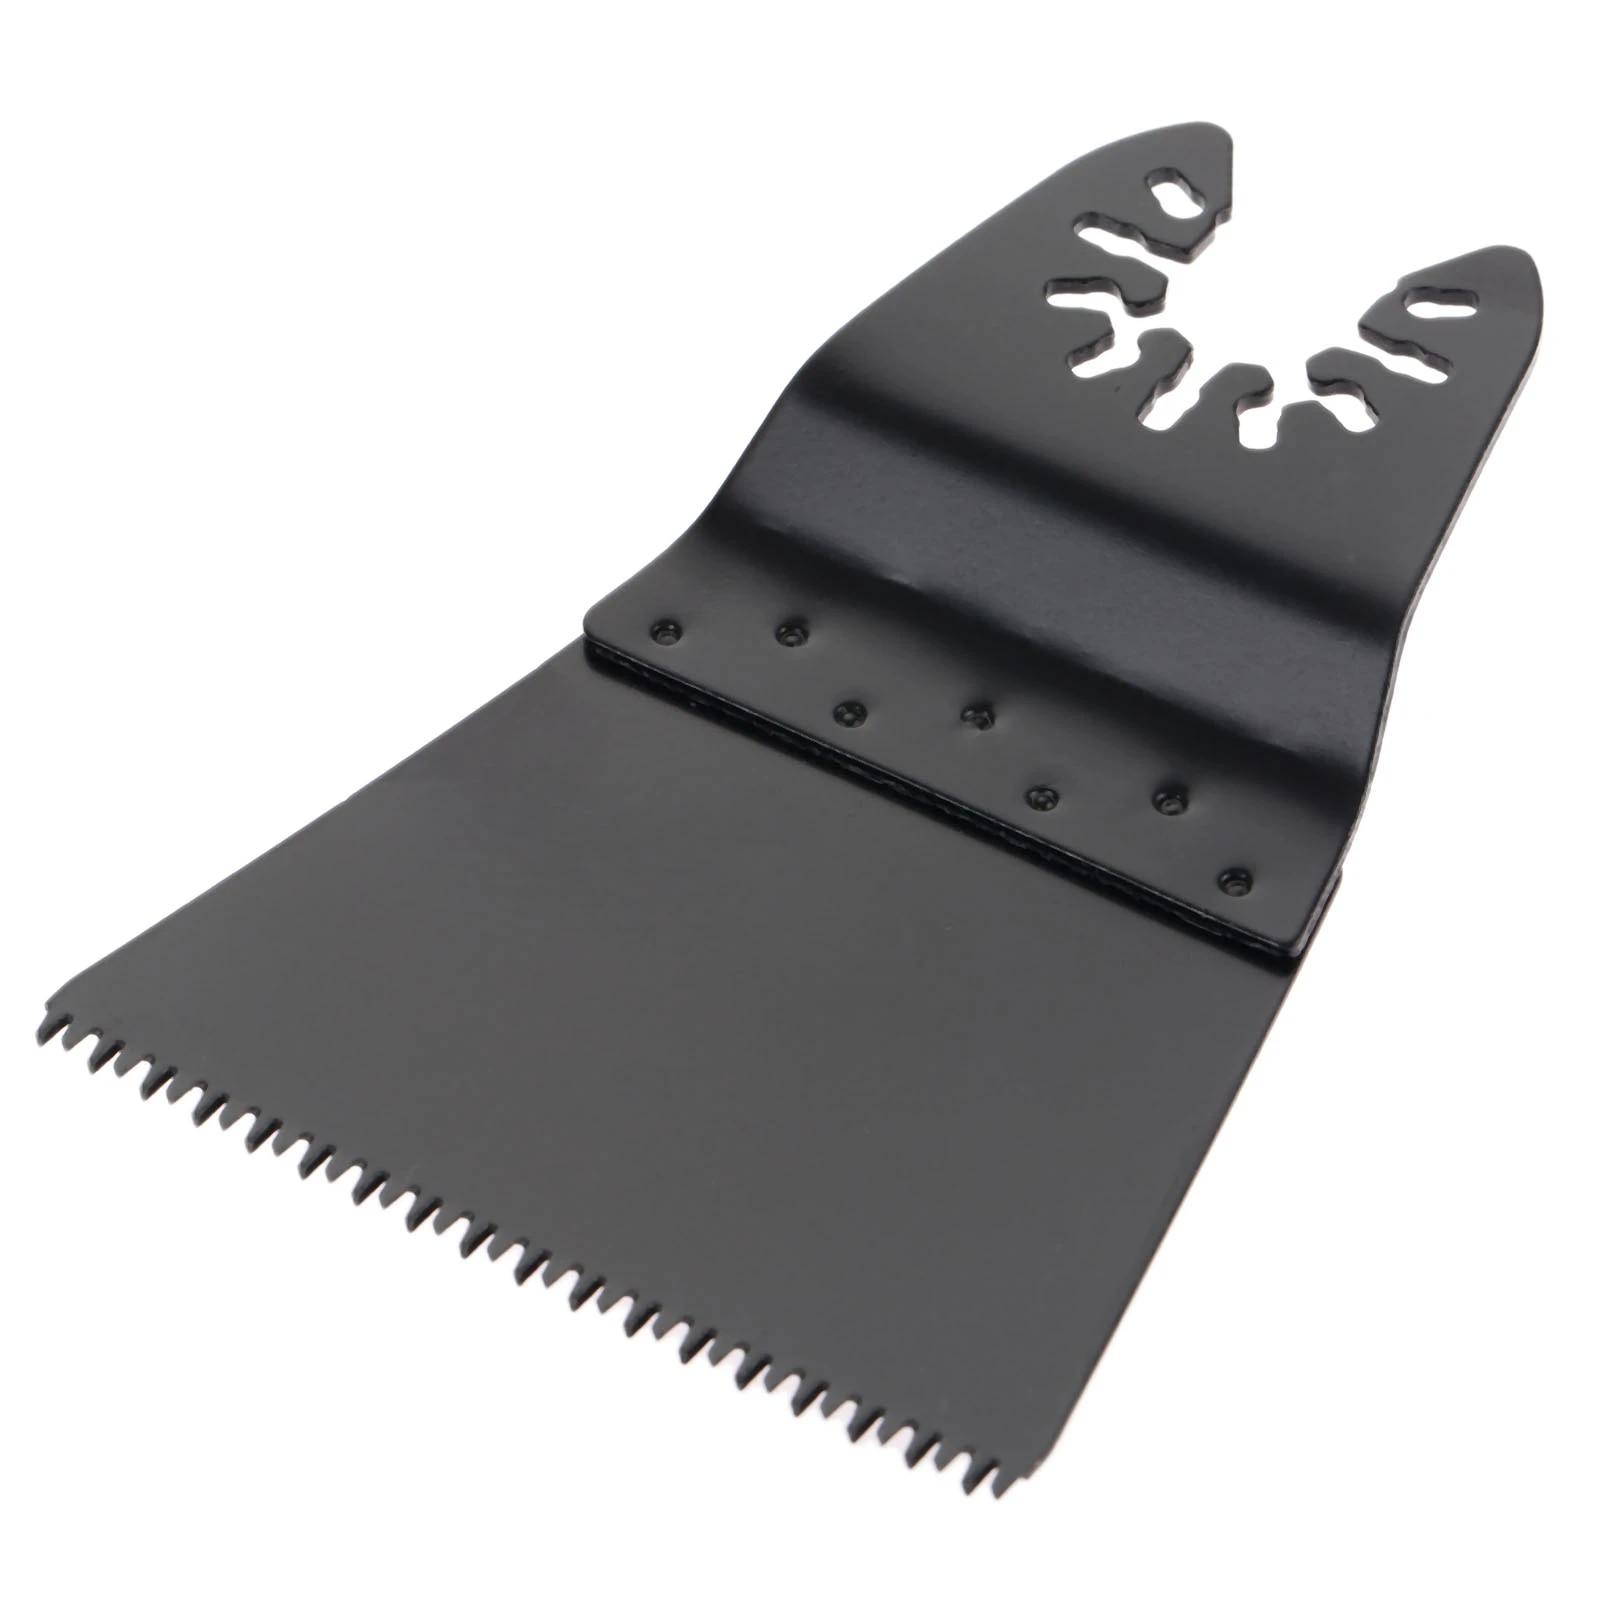 10pcs Oscillating Multi Tool 65mm Saw Blades Cutting Wood Plastic For  UK